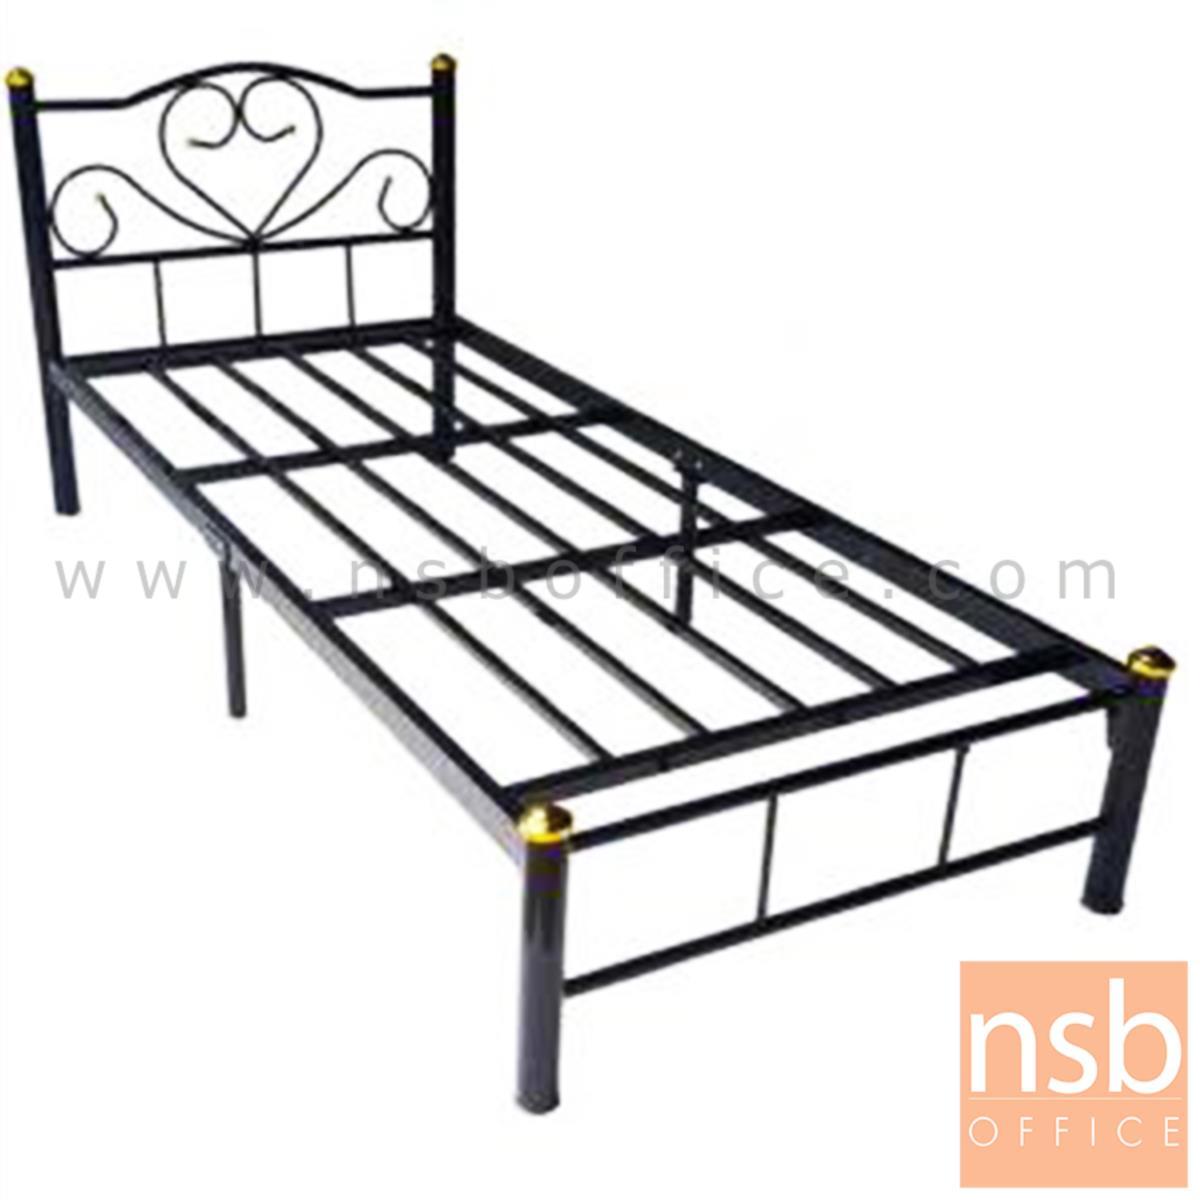 G11A003:เตียงเหล็กชั้นเดียว 3 ฟุต รุ่นมาตรฐาน หนา 0.7 mm. ขนาด 91.4W* 200D* 33H cm. สีดำ (ลายบัว)